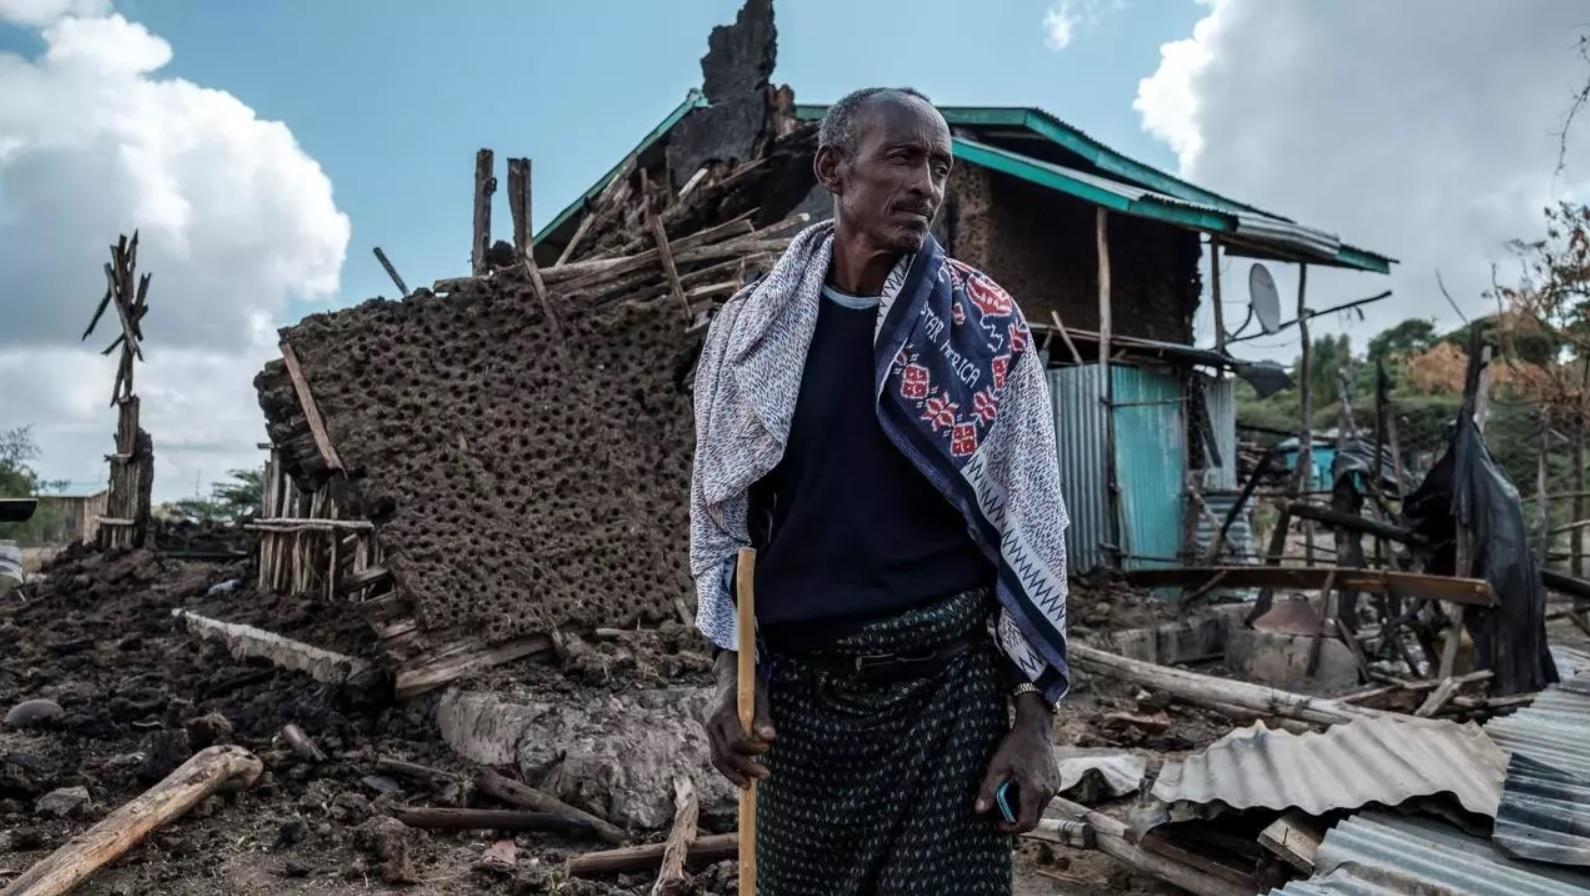 Etiopia, Centinaia Di Civili Massacrati Dalle Forze Eritree Ad Axum